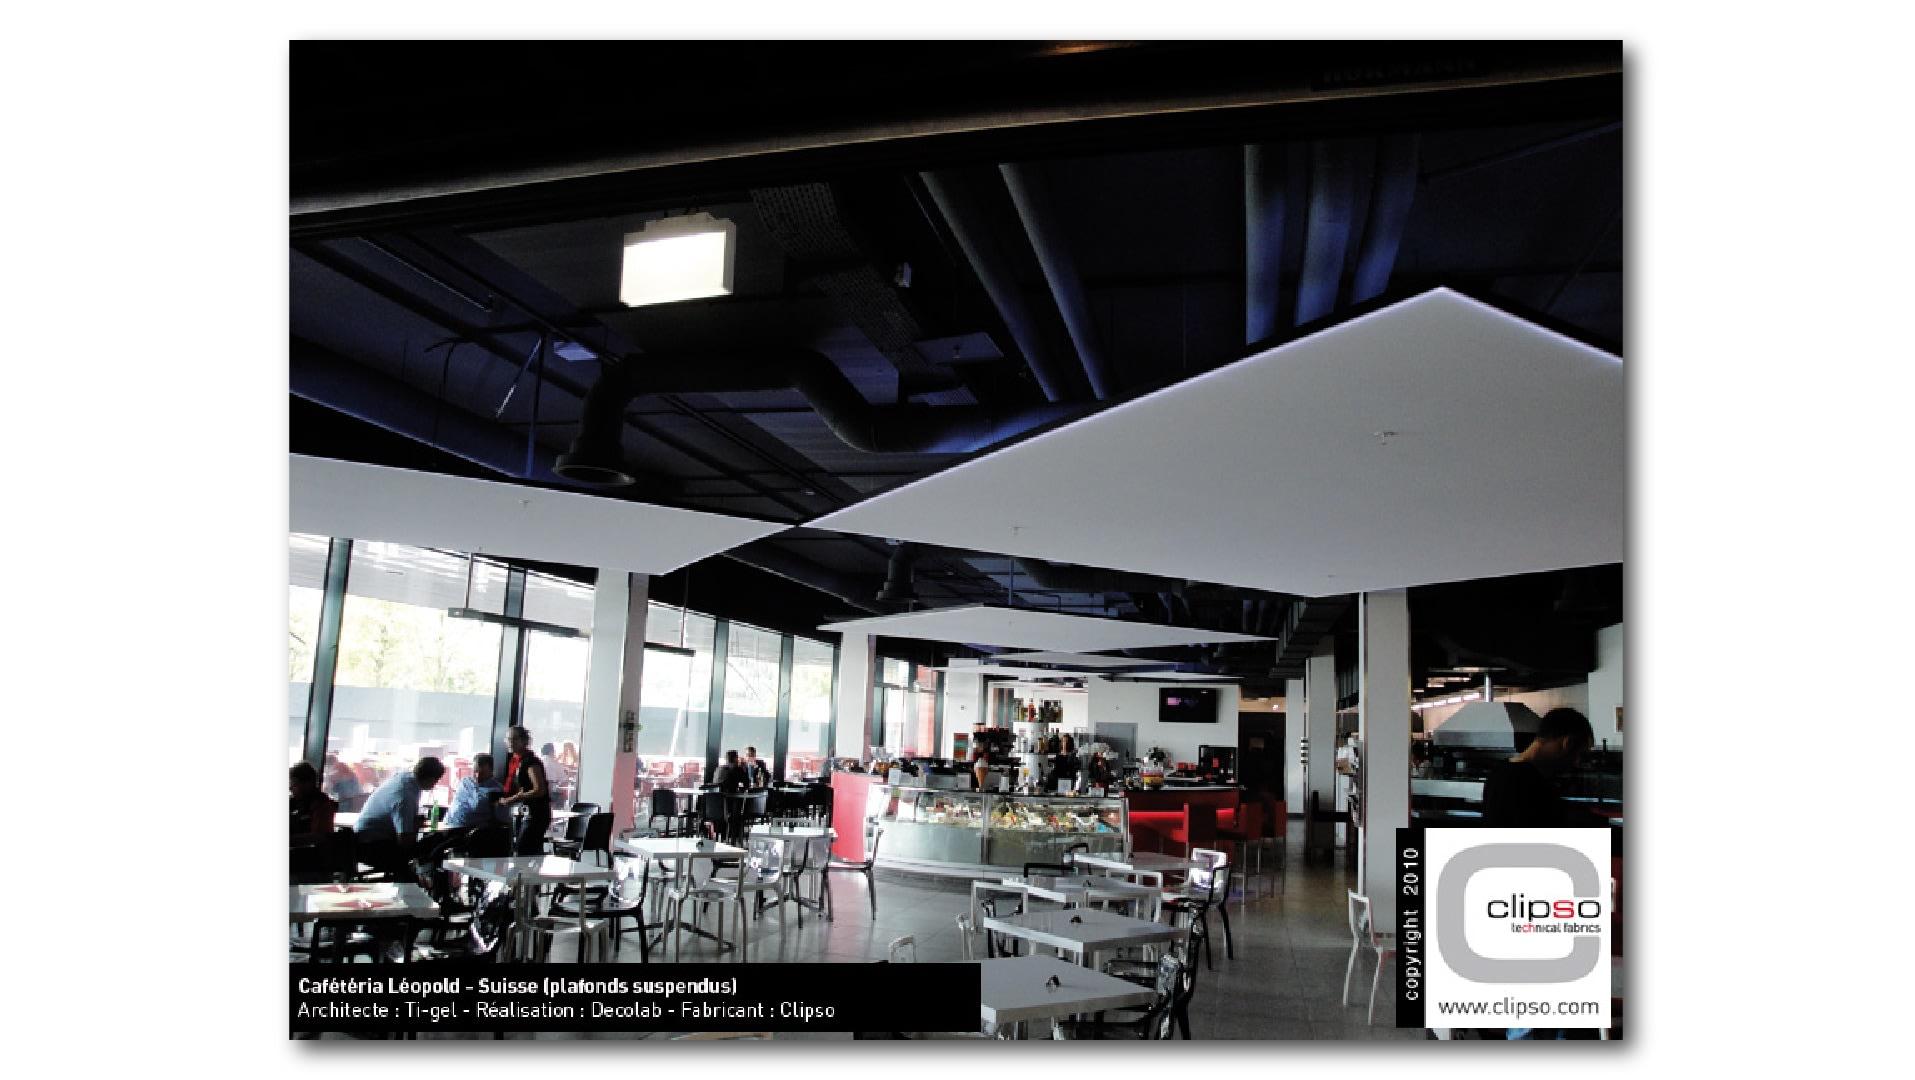 Deckensegel-Clipso-Acoustic-Cafeteria-01_jv6t7o